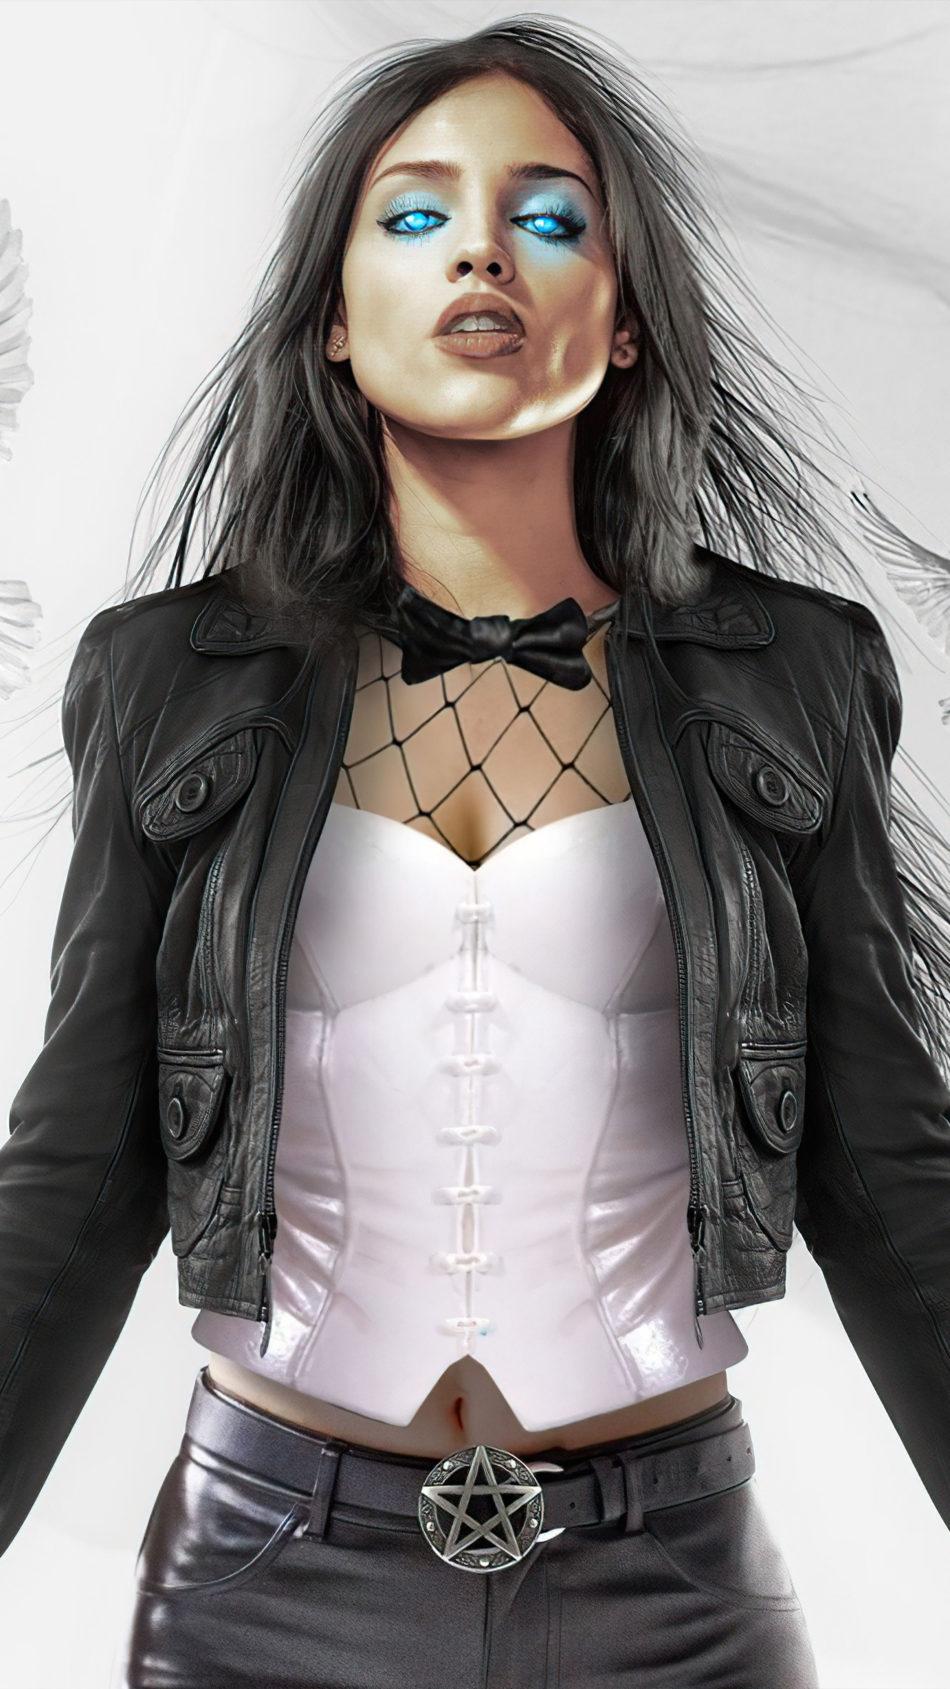 Eiza Gonzalez As Zatanna 4K Ultra HD Mobile Wallpaper